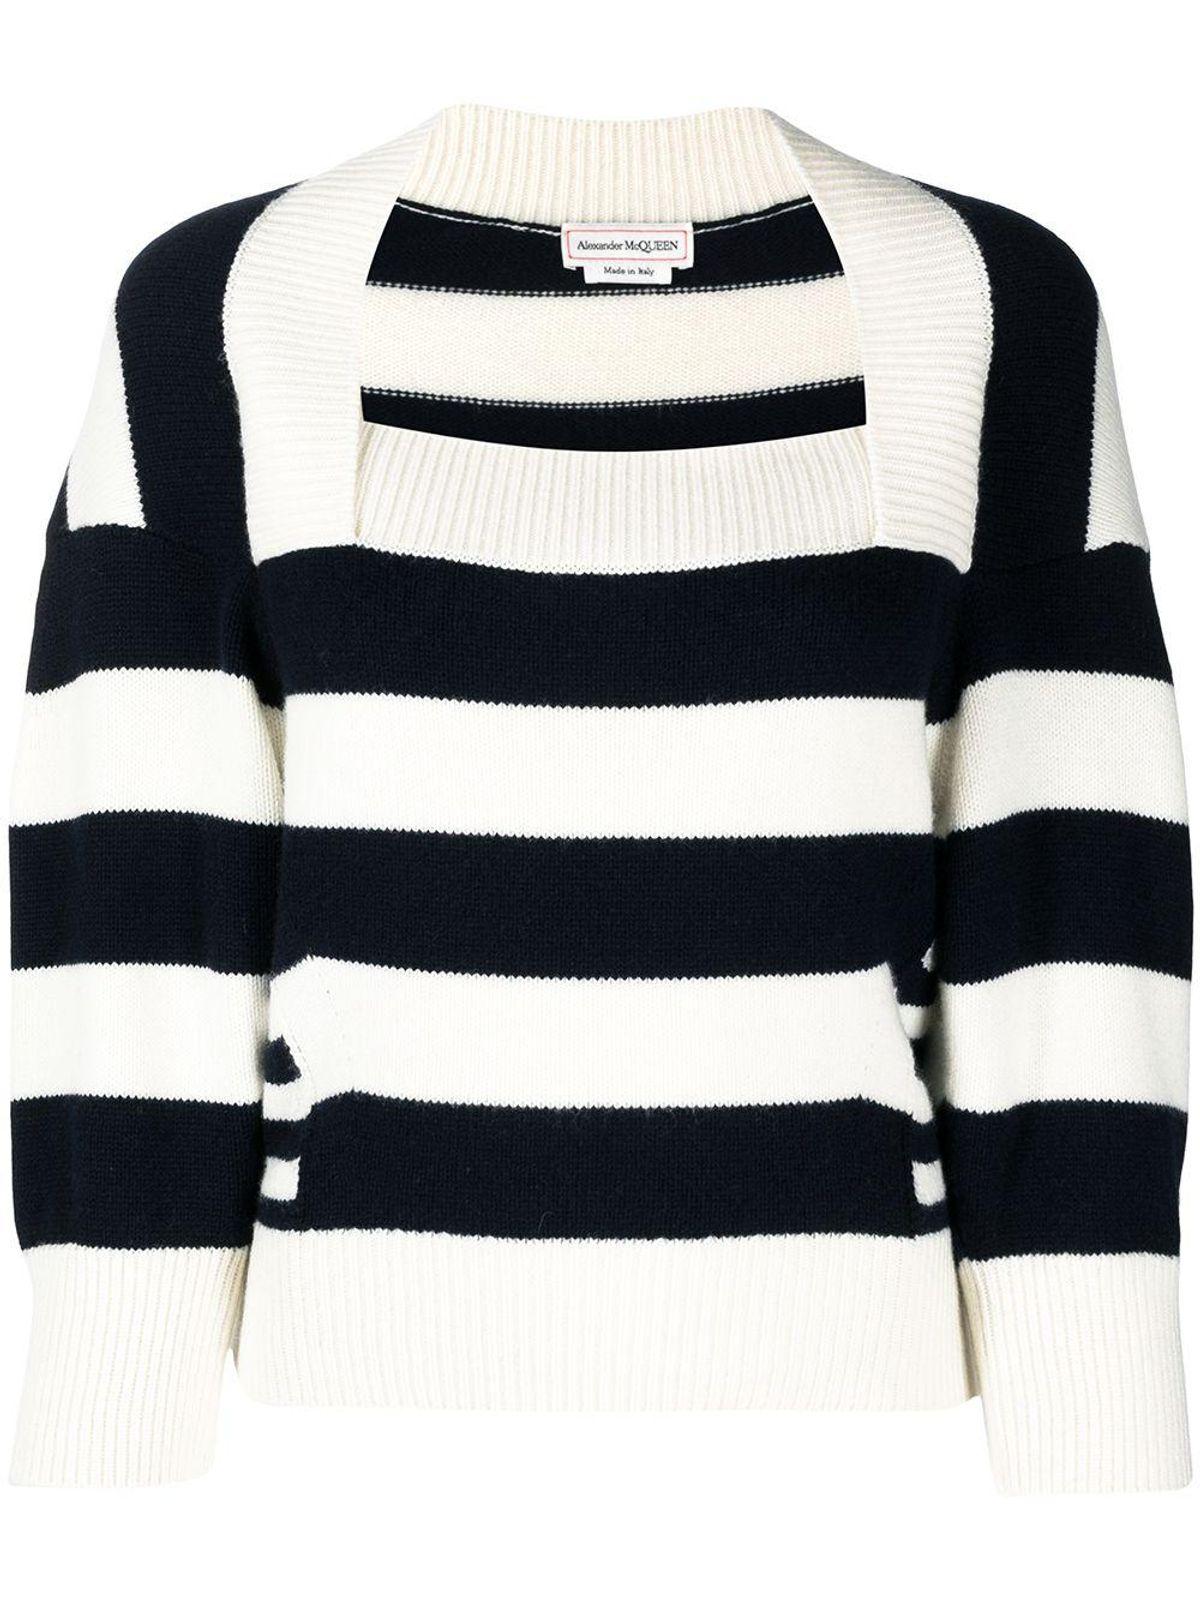 alexander mcqueen striped wool cashmere top